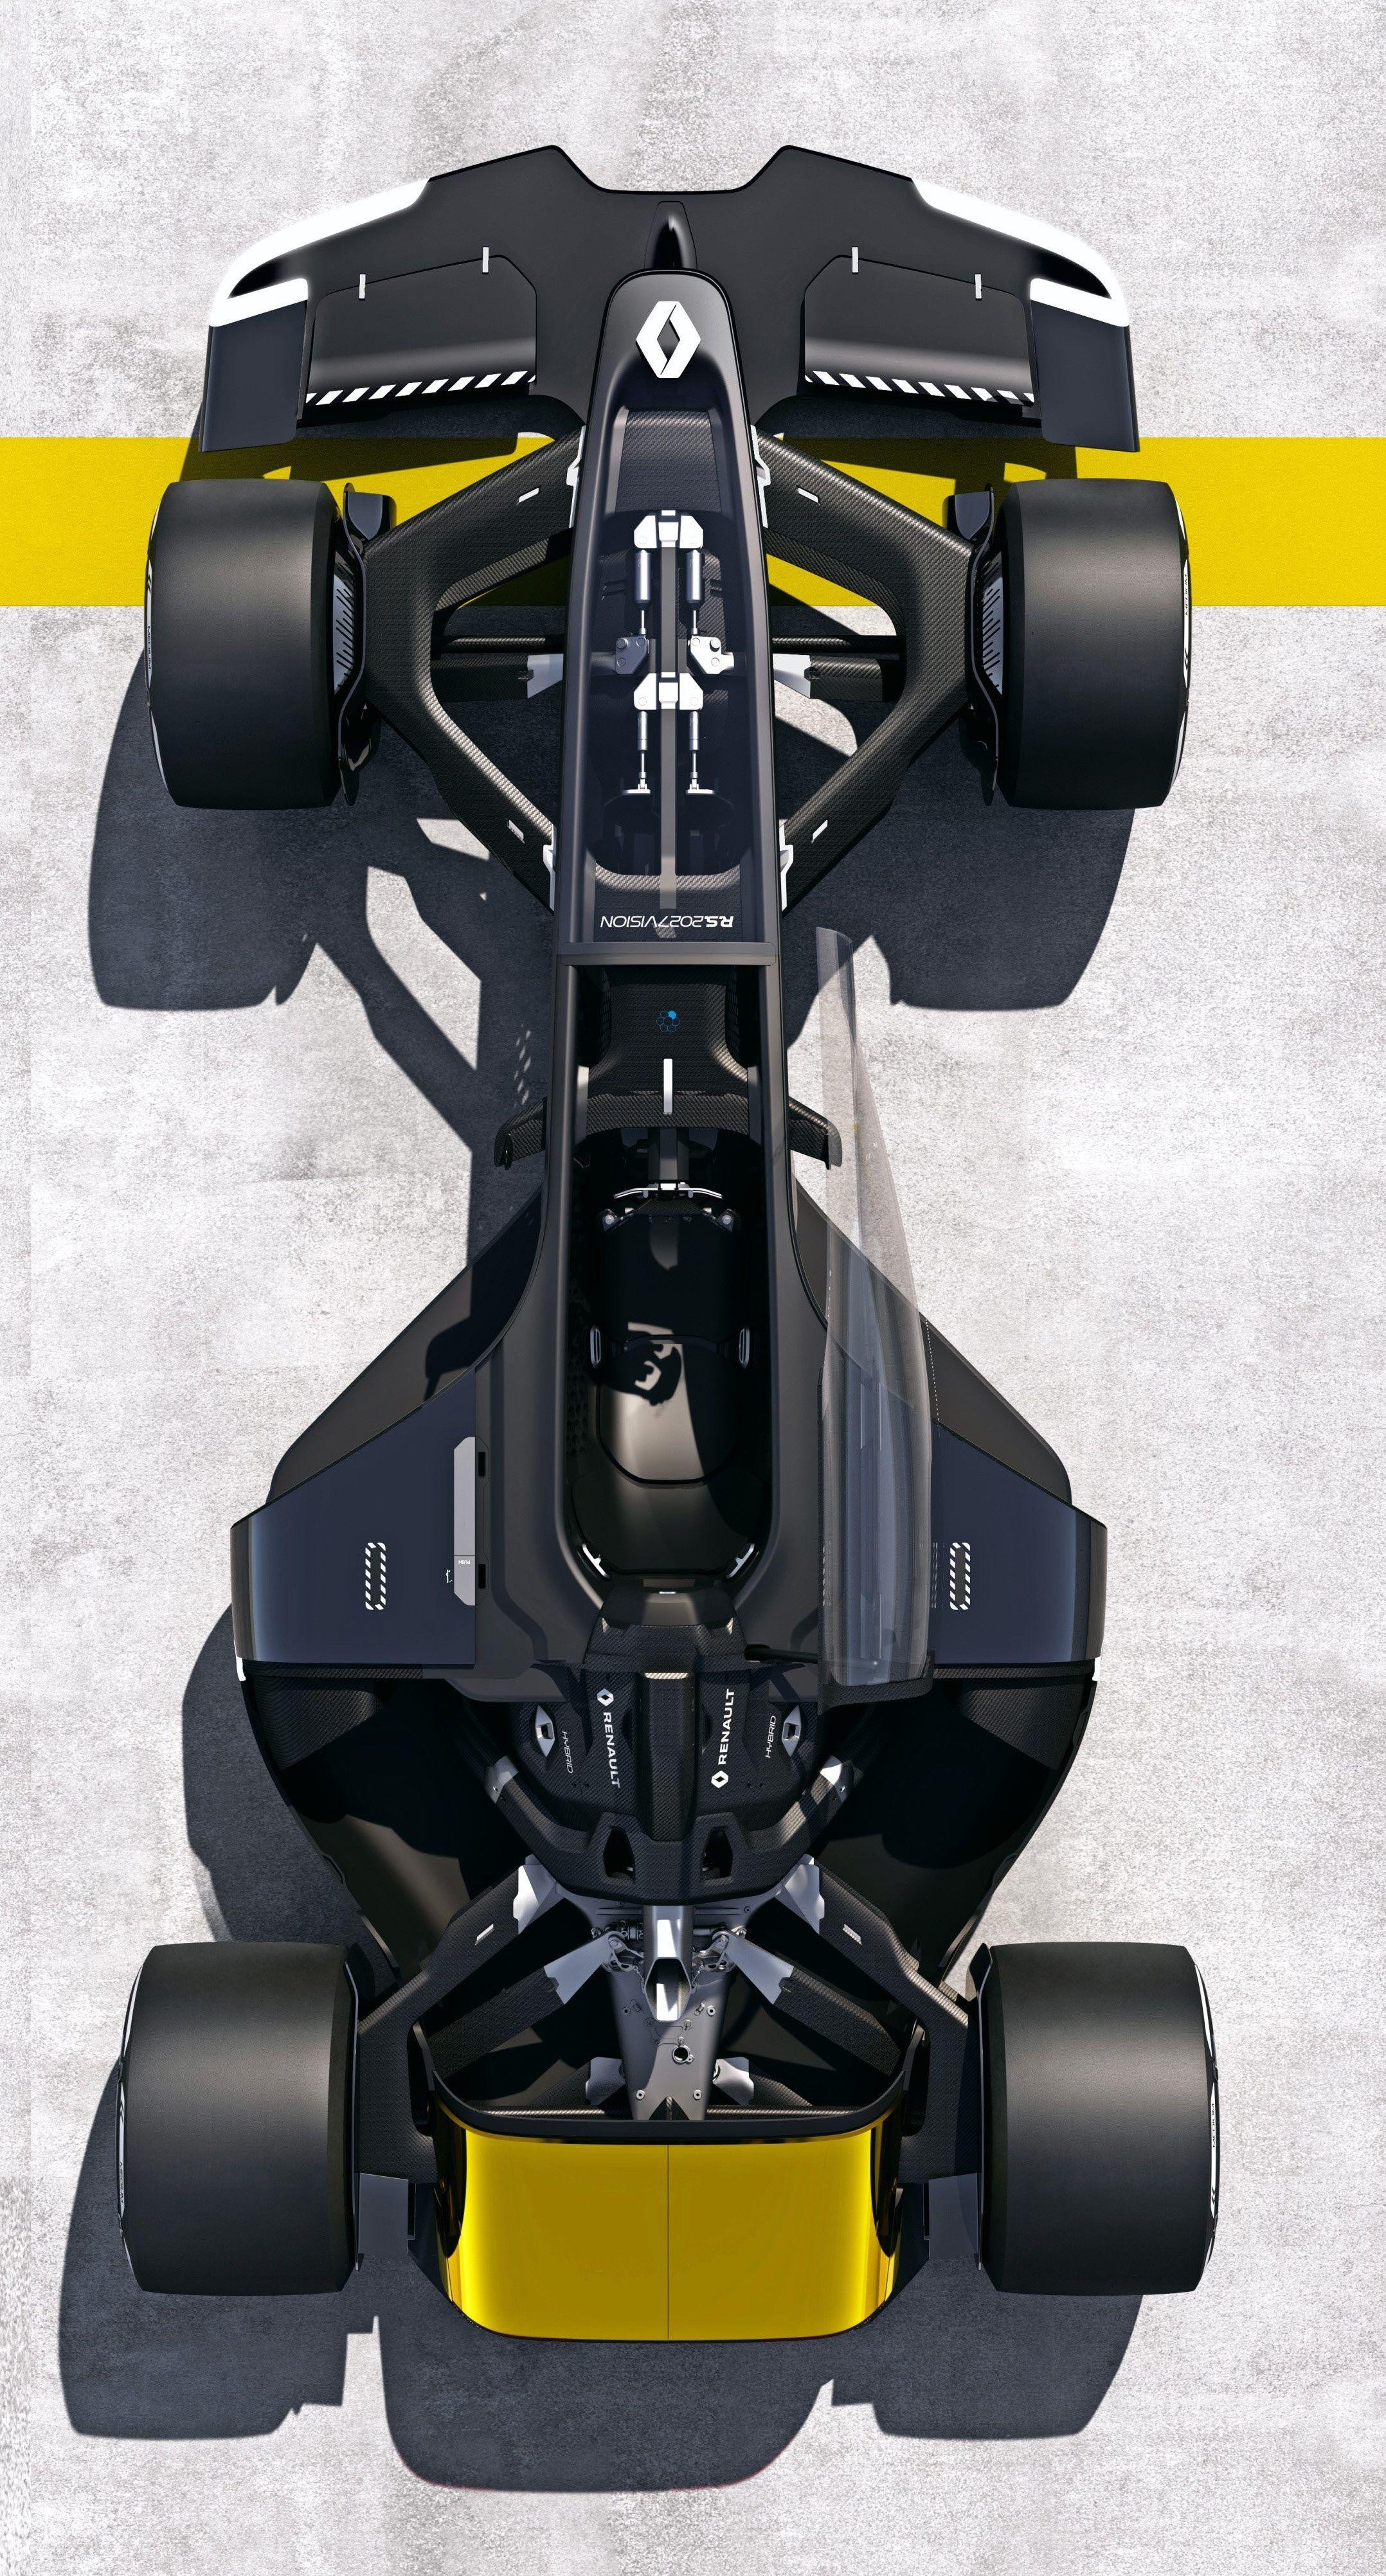 Renault R.S. 2027 Vision Sports cars, Sport cars, Automotive